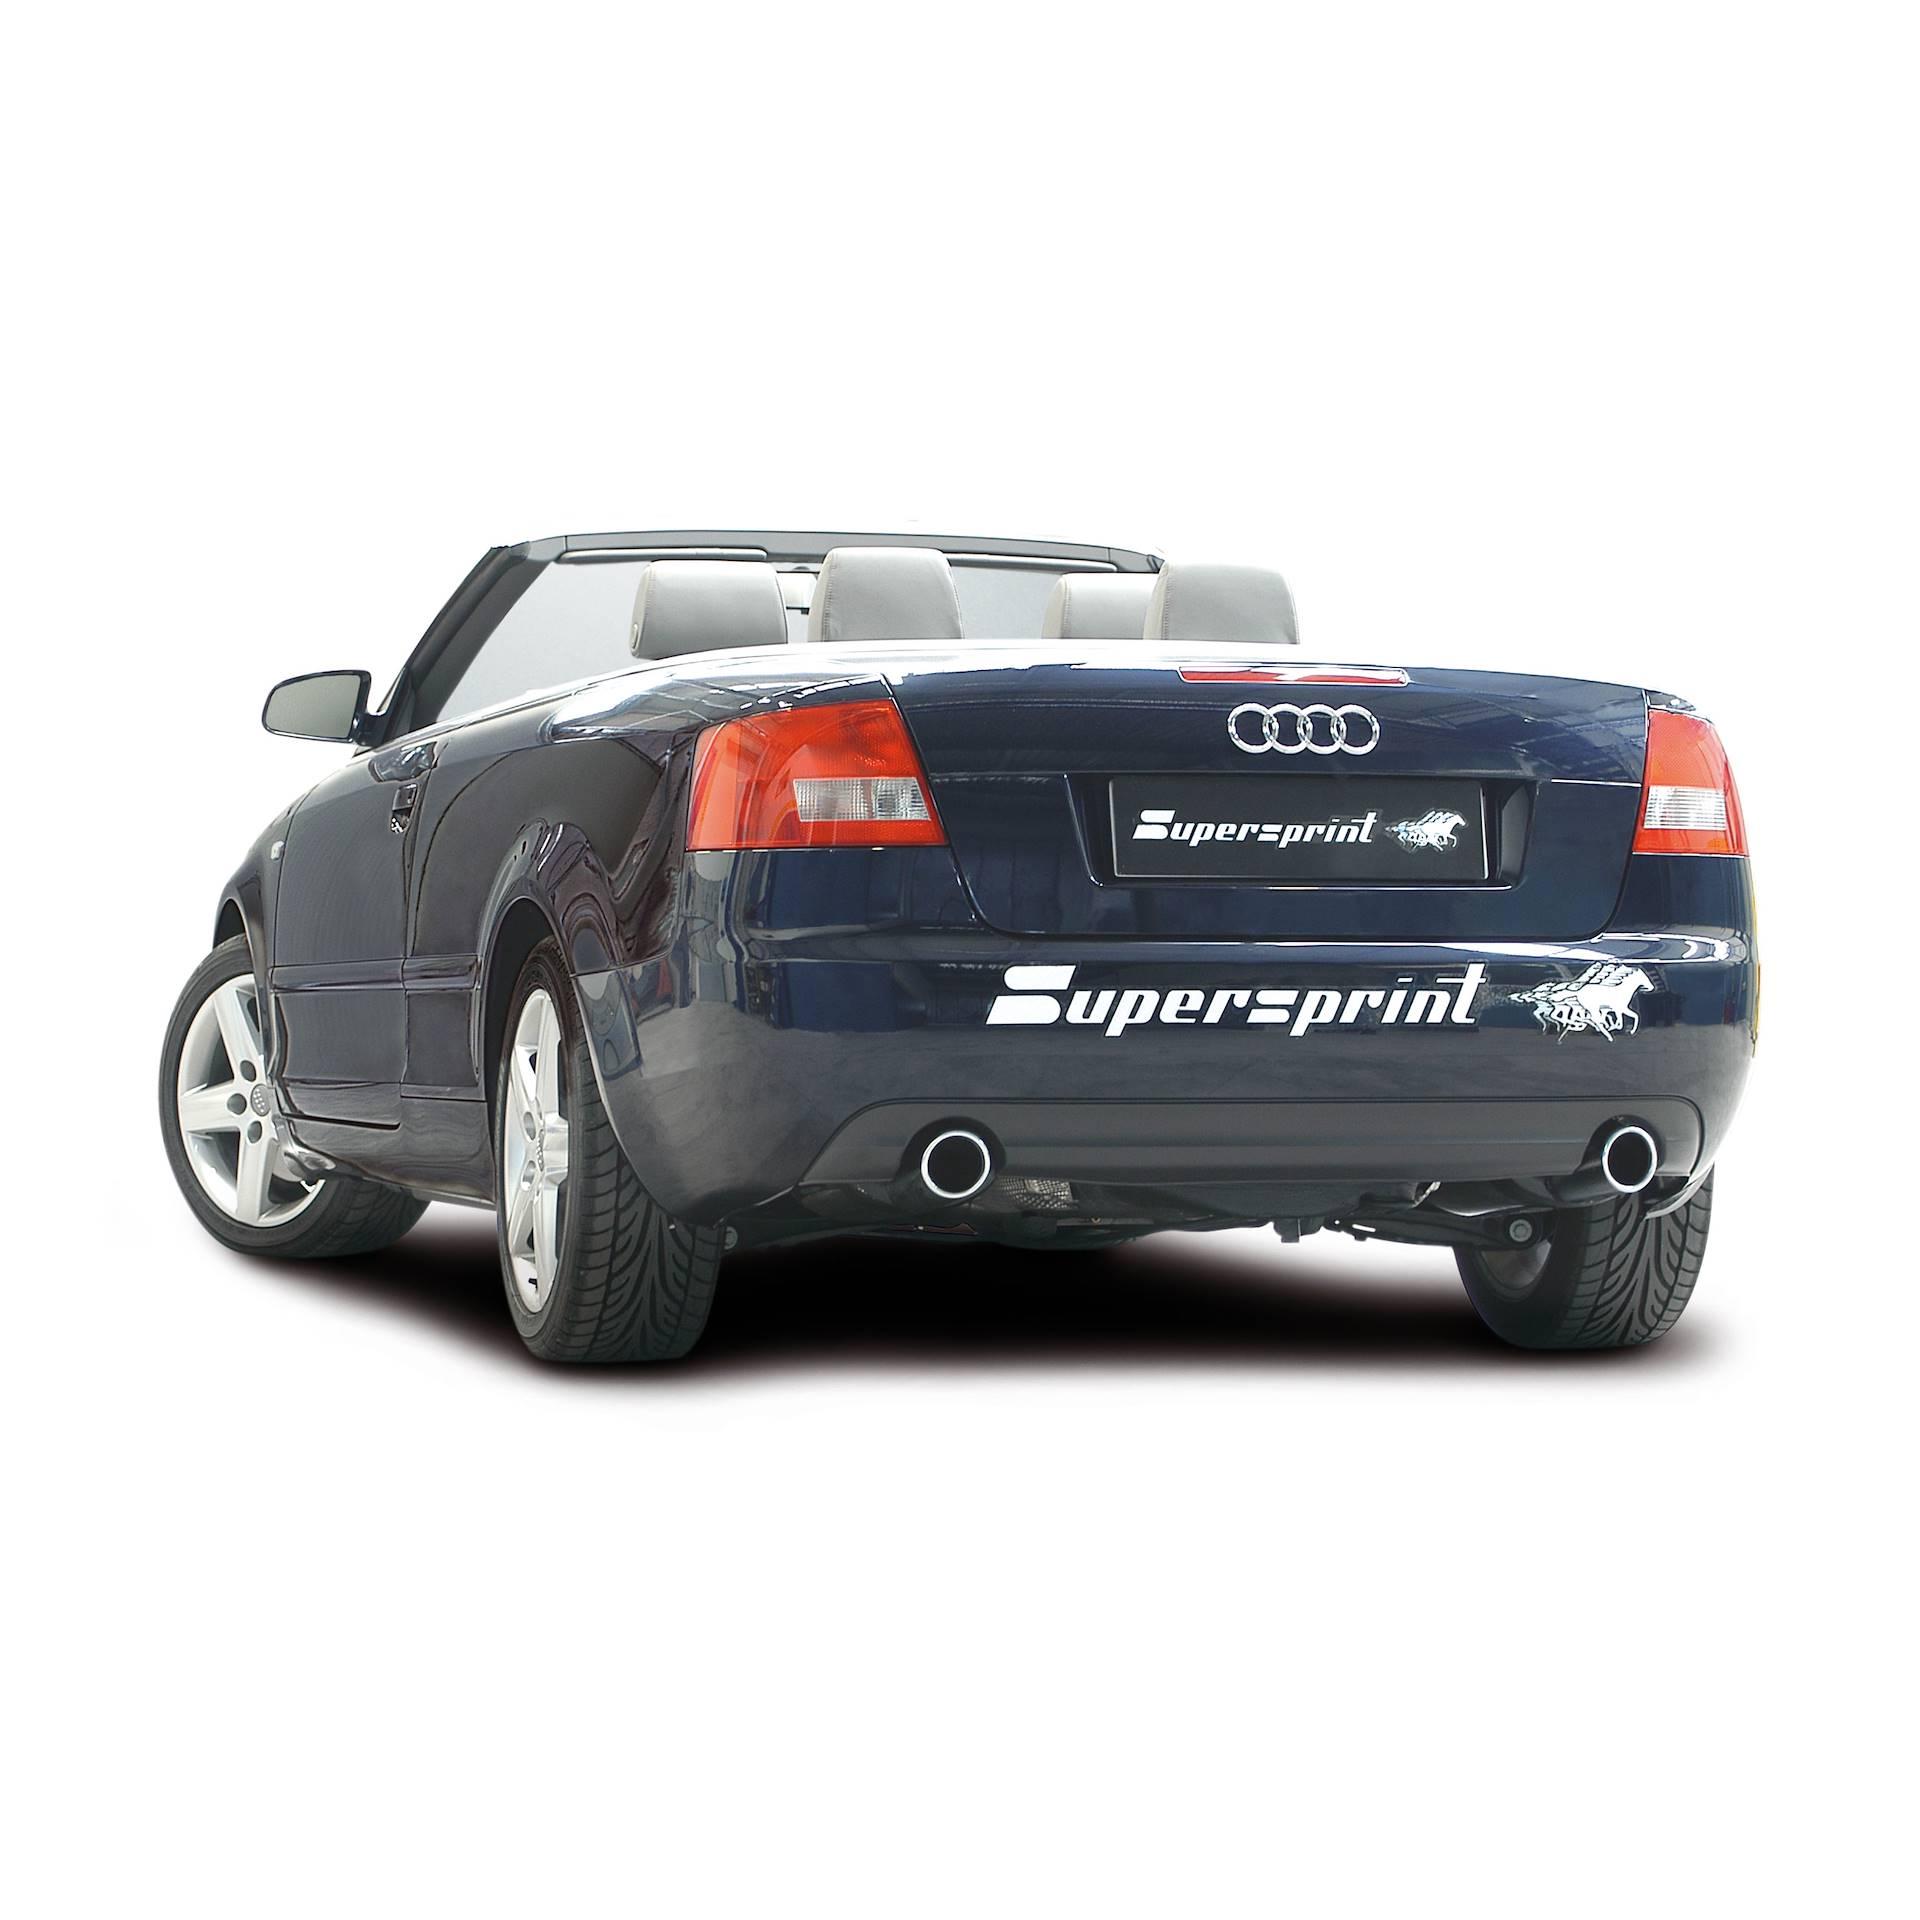 AUDI A4 QUATTRO CABRIO 3.0i V6 (220 Hp) ' 03 ->'06, Audi